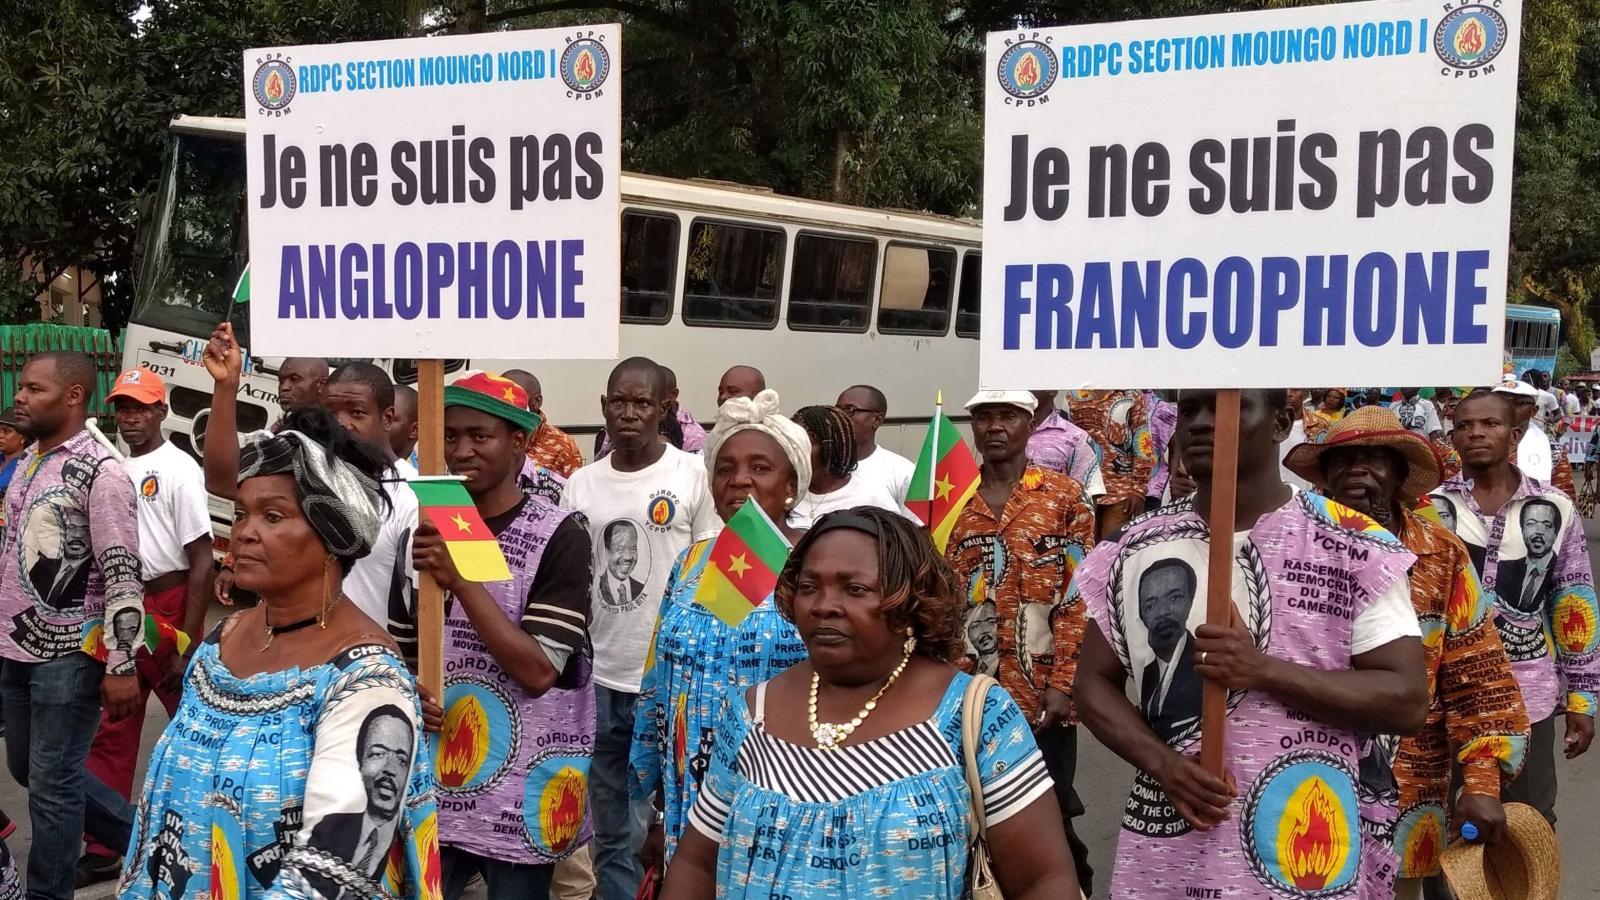 Cameroonian separatists' jailing sparks shutdown protest in anglophone region